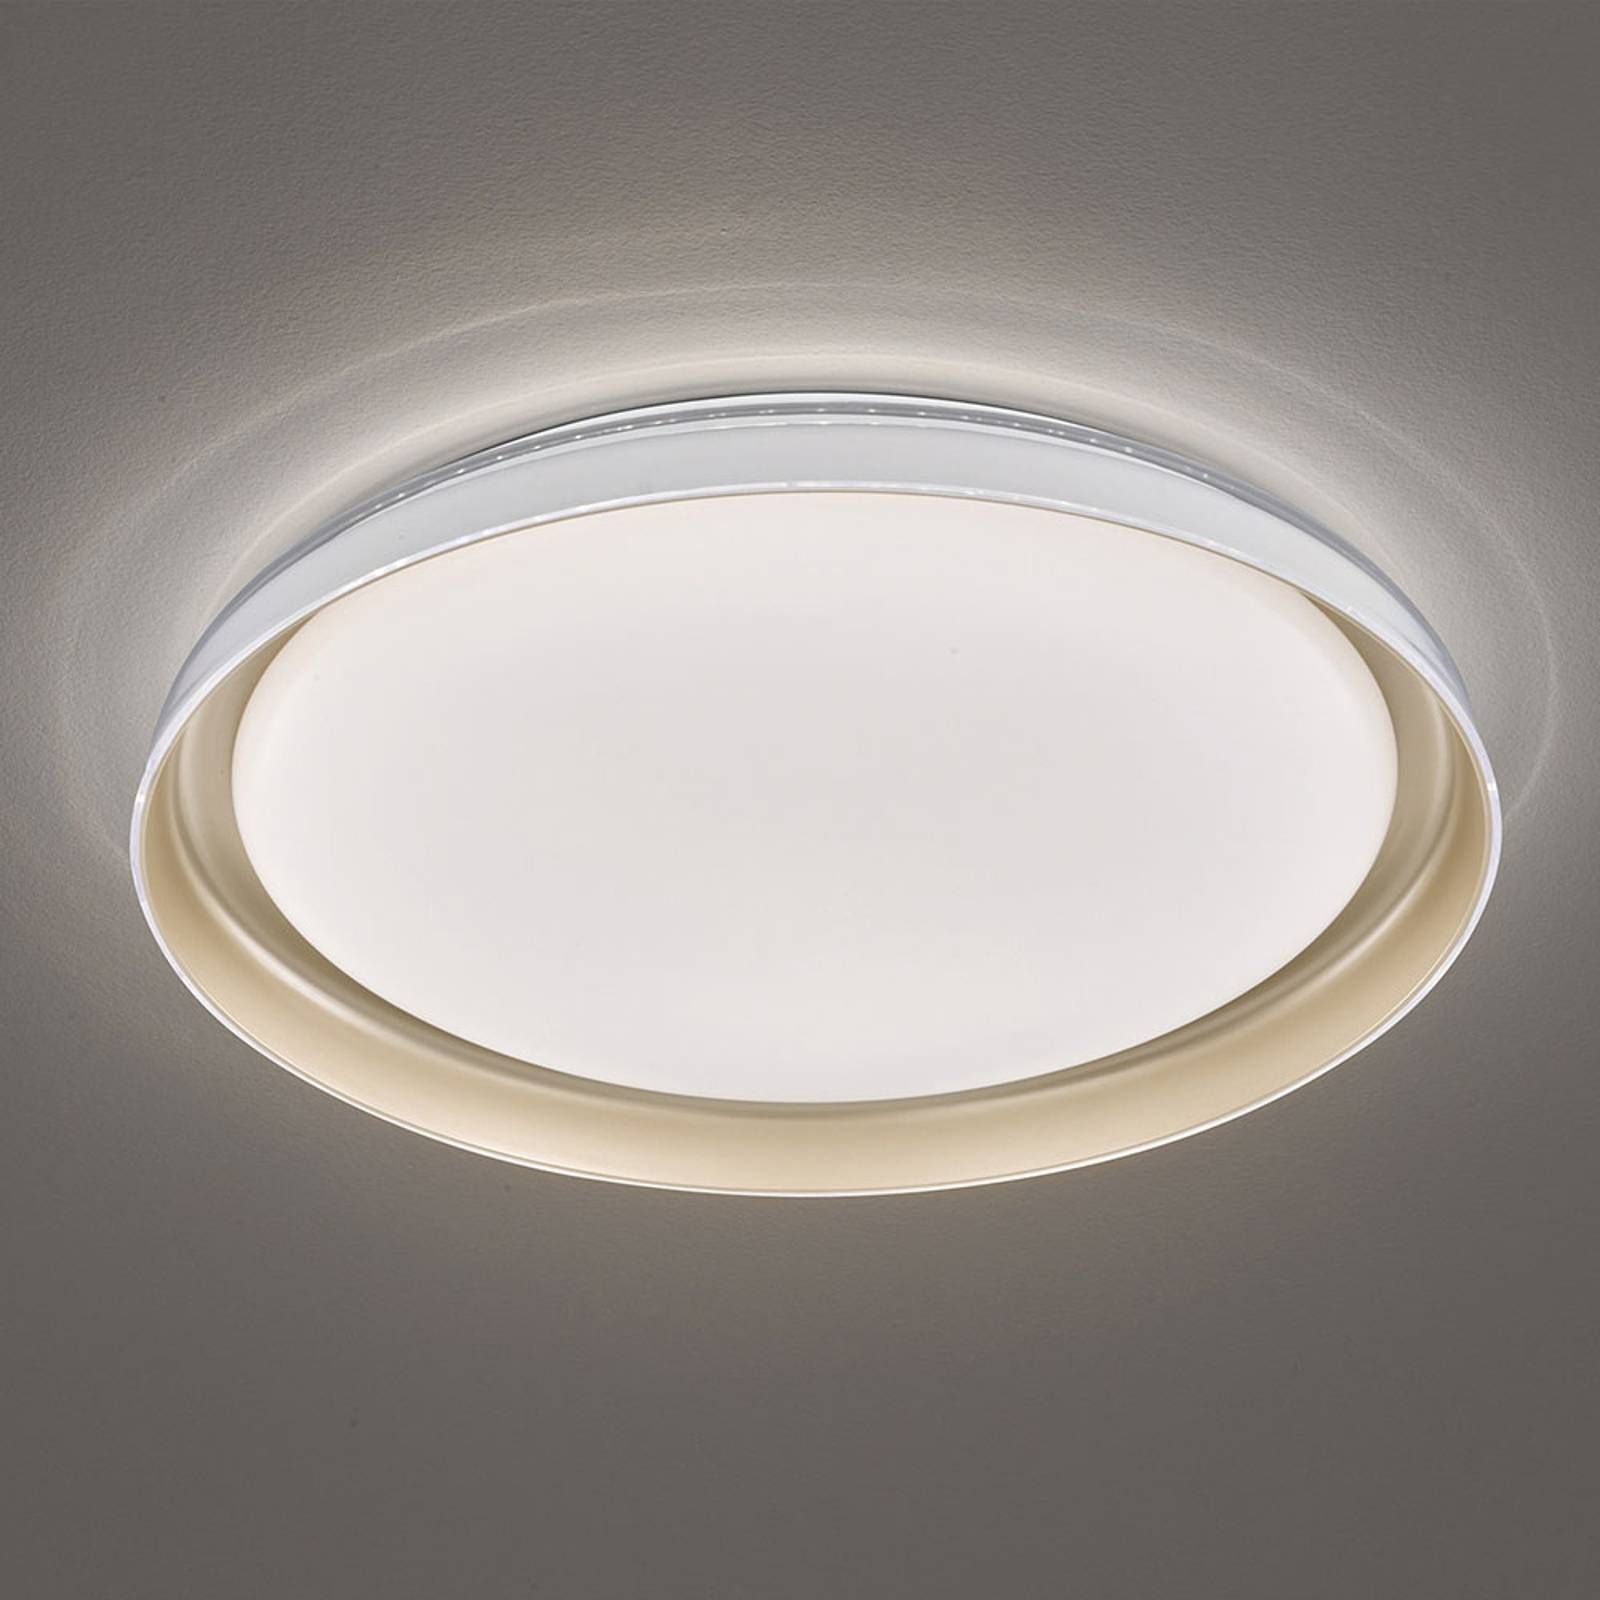 LED plafondlamp Rilla, dimbaar, Ø 43 cm